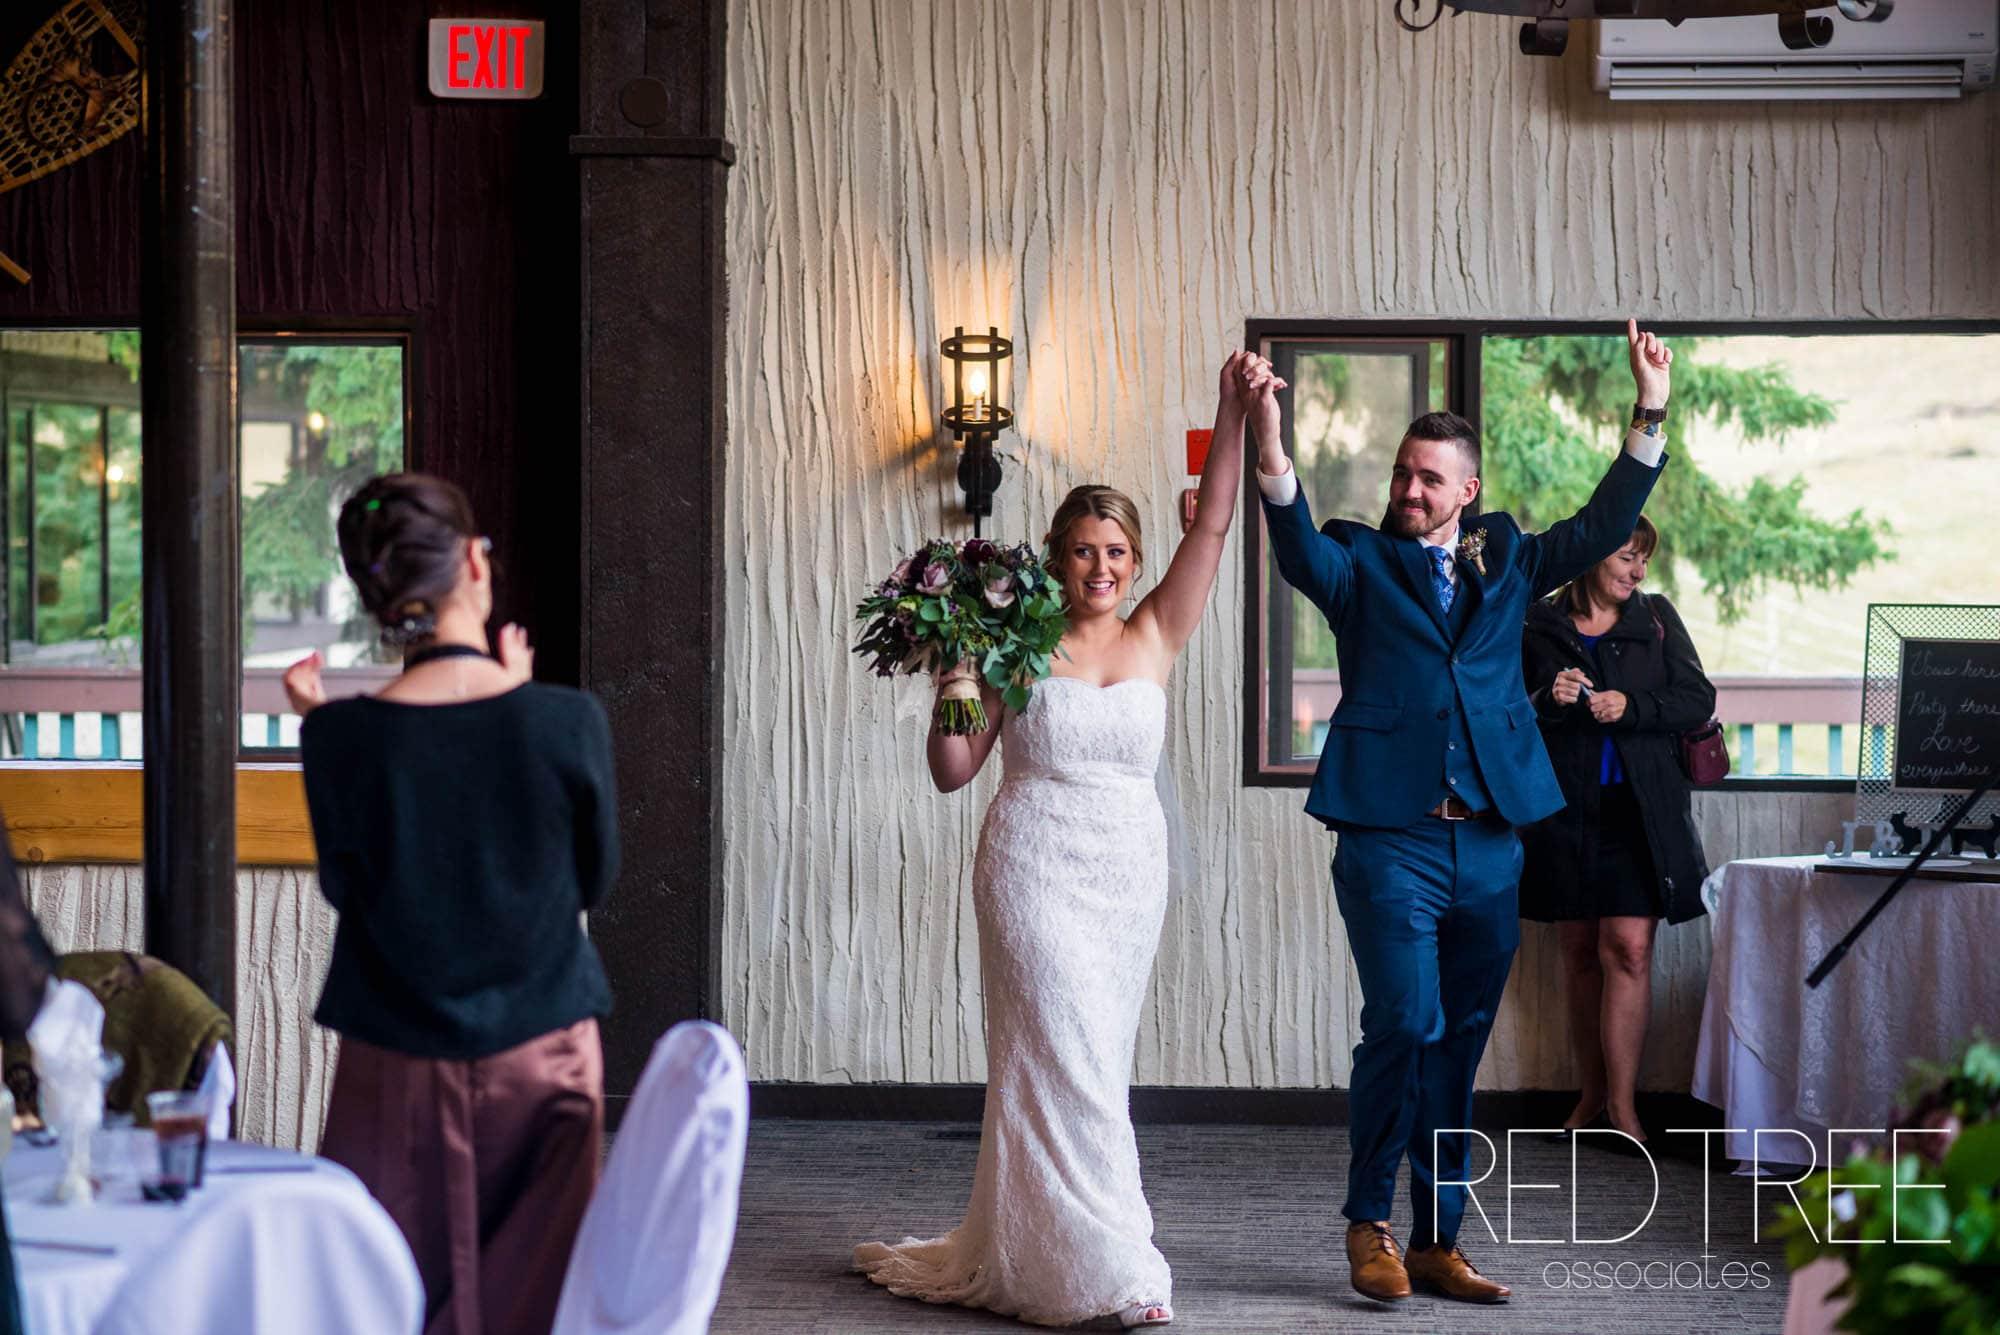 Red Wedding Photography: RED DEER WEDDING PHOTOGRAPHER: CANYON SKI RESORT WEDDING